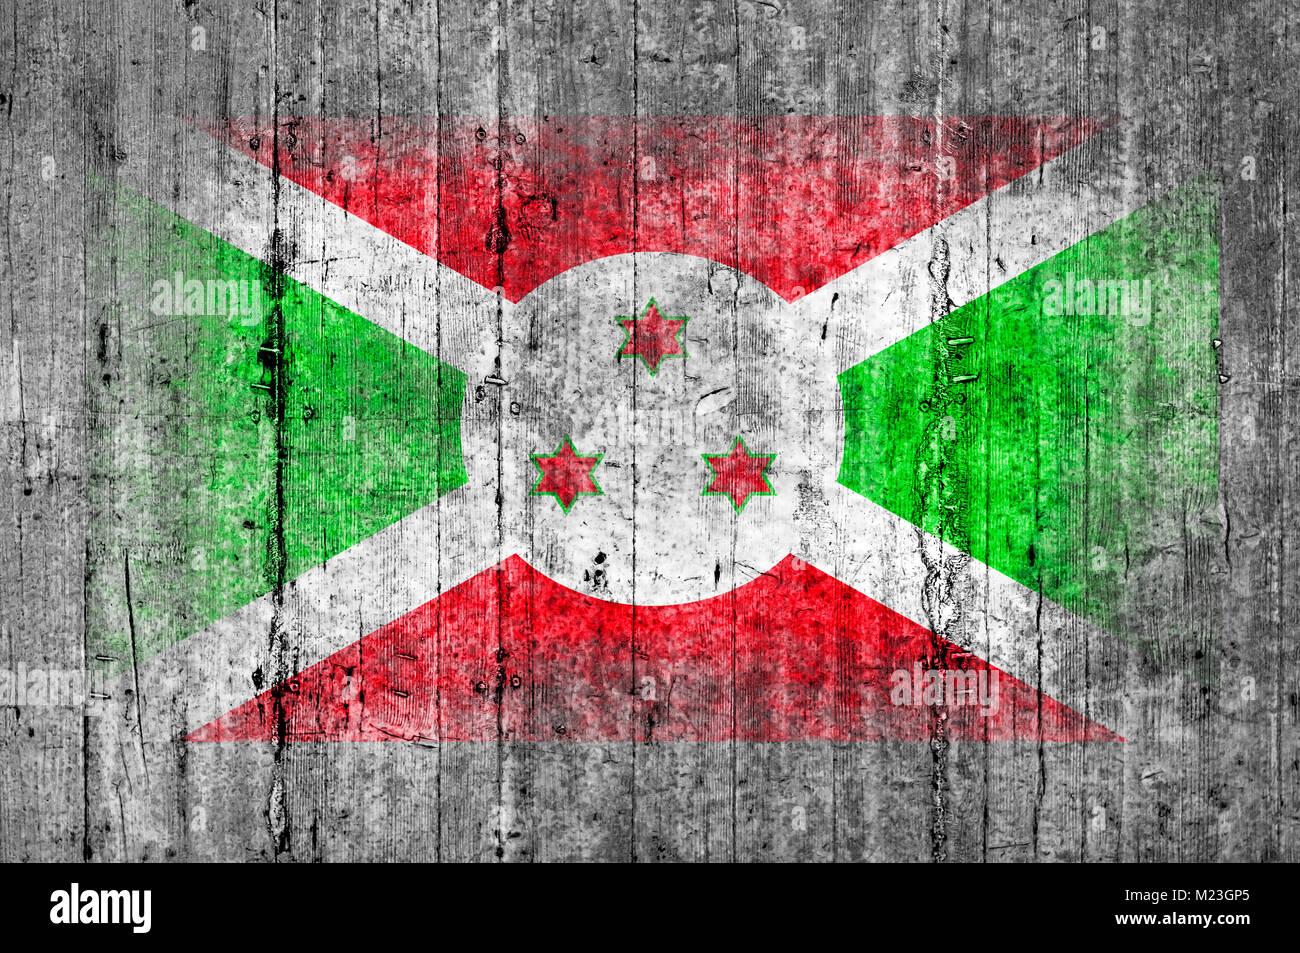 Burundi flag painted on background texture gray concrete - Stock Image